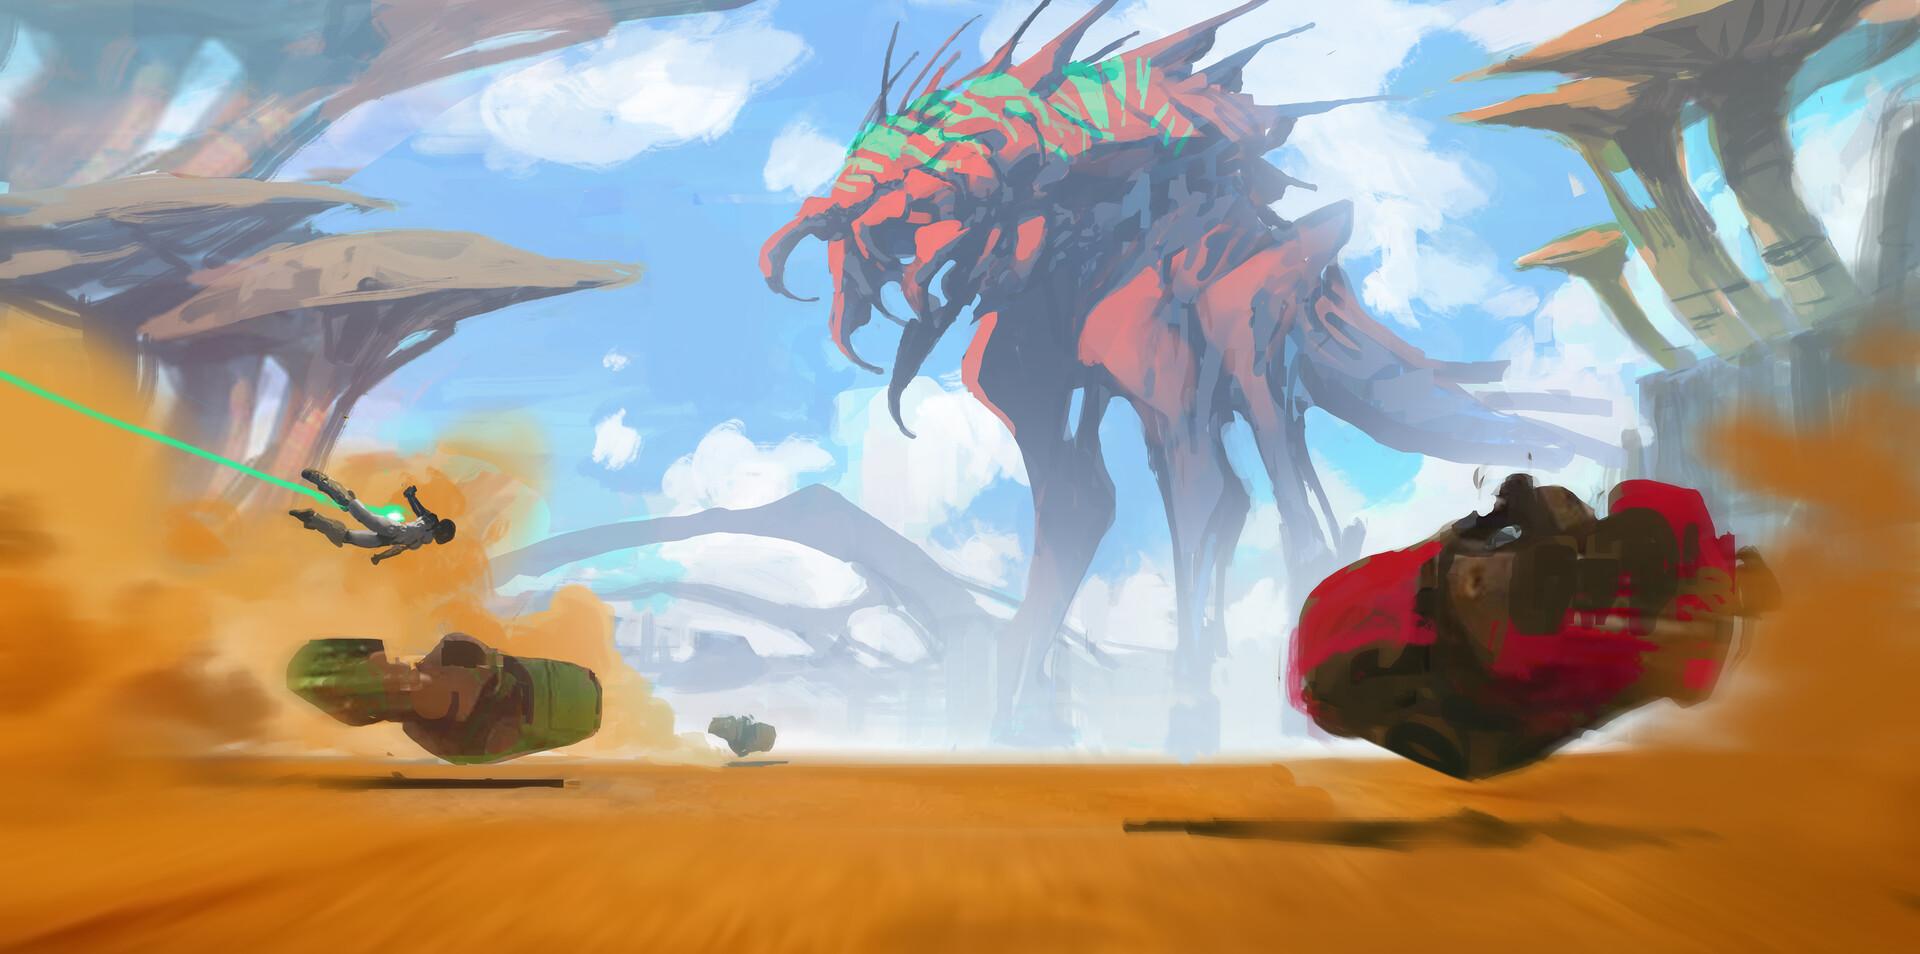 Kory lynn hubbell attackon monster color rough